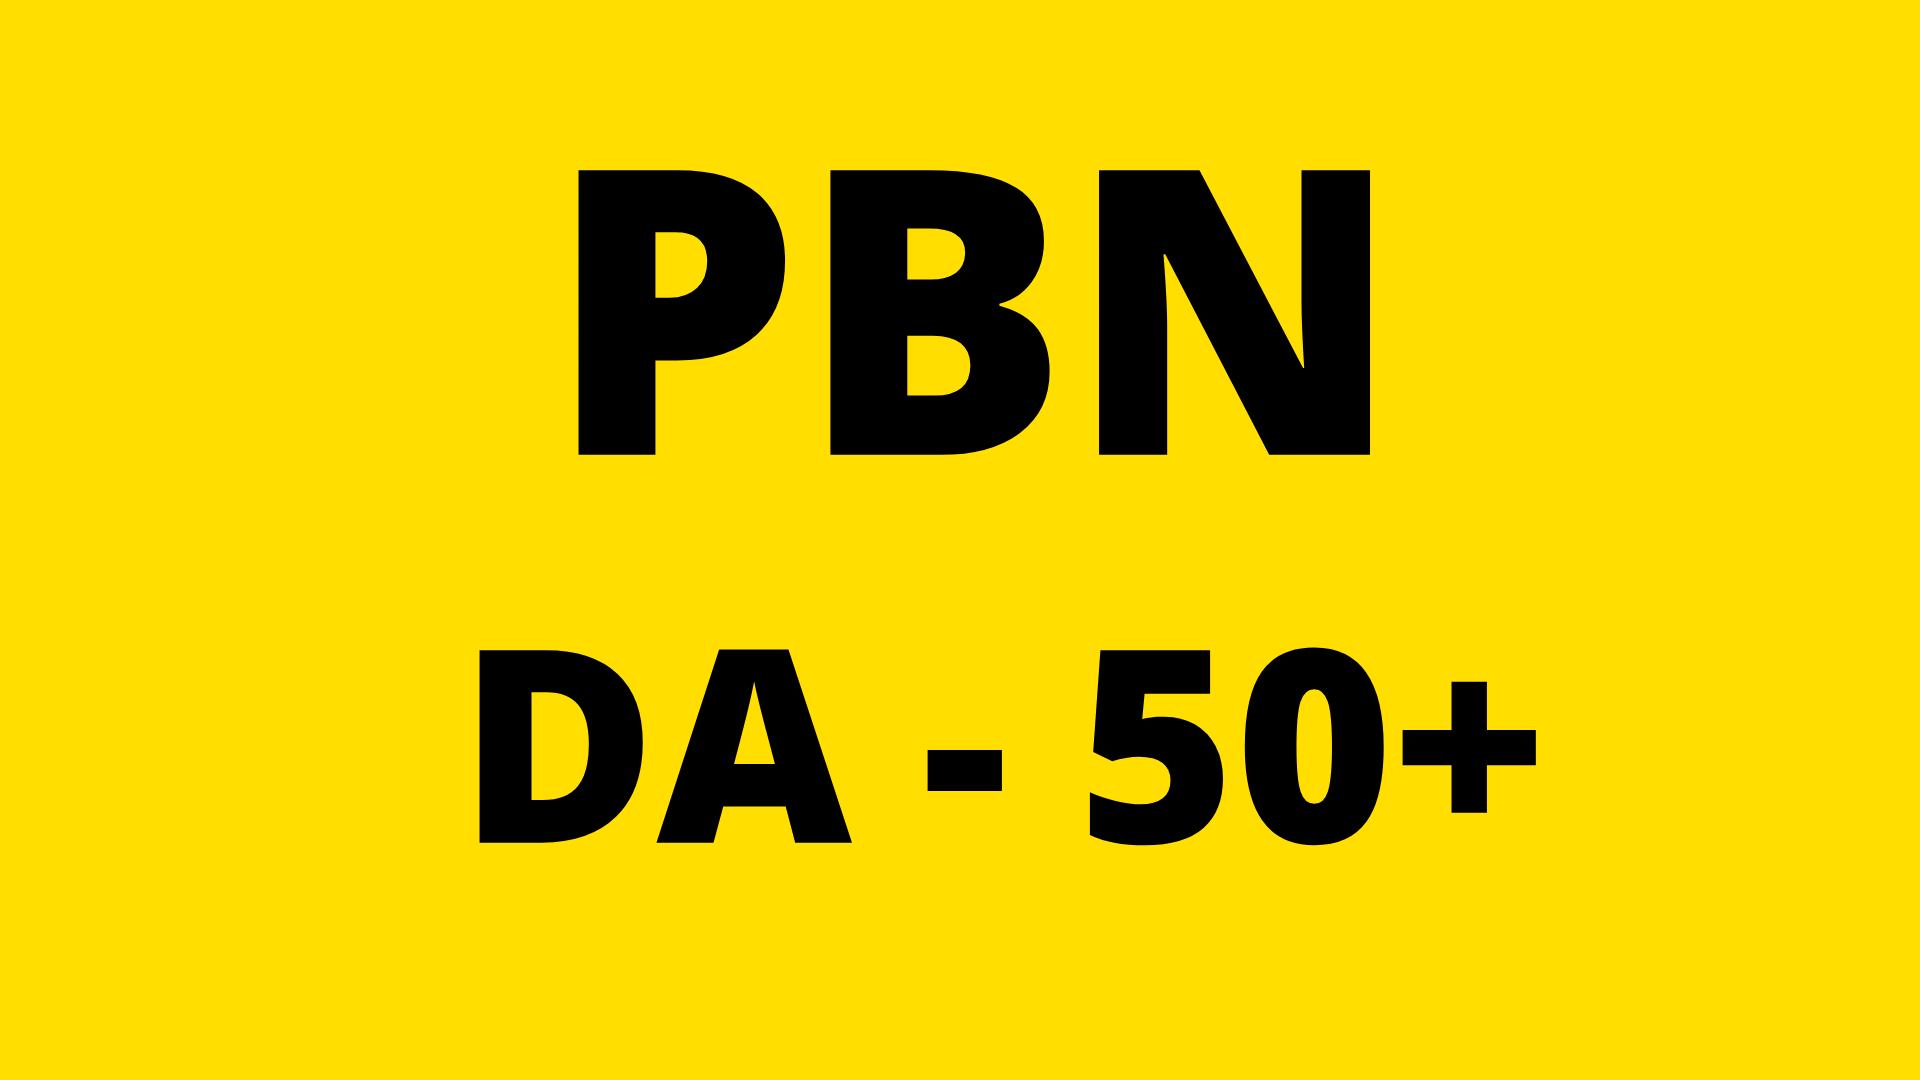 Build DA 50 Plus 50 PBN Backlinks